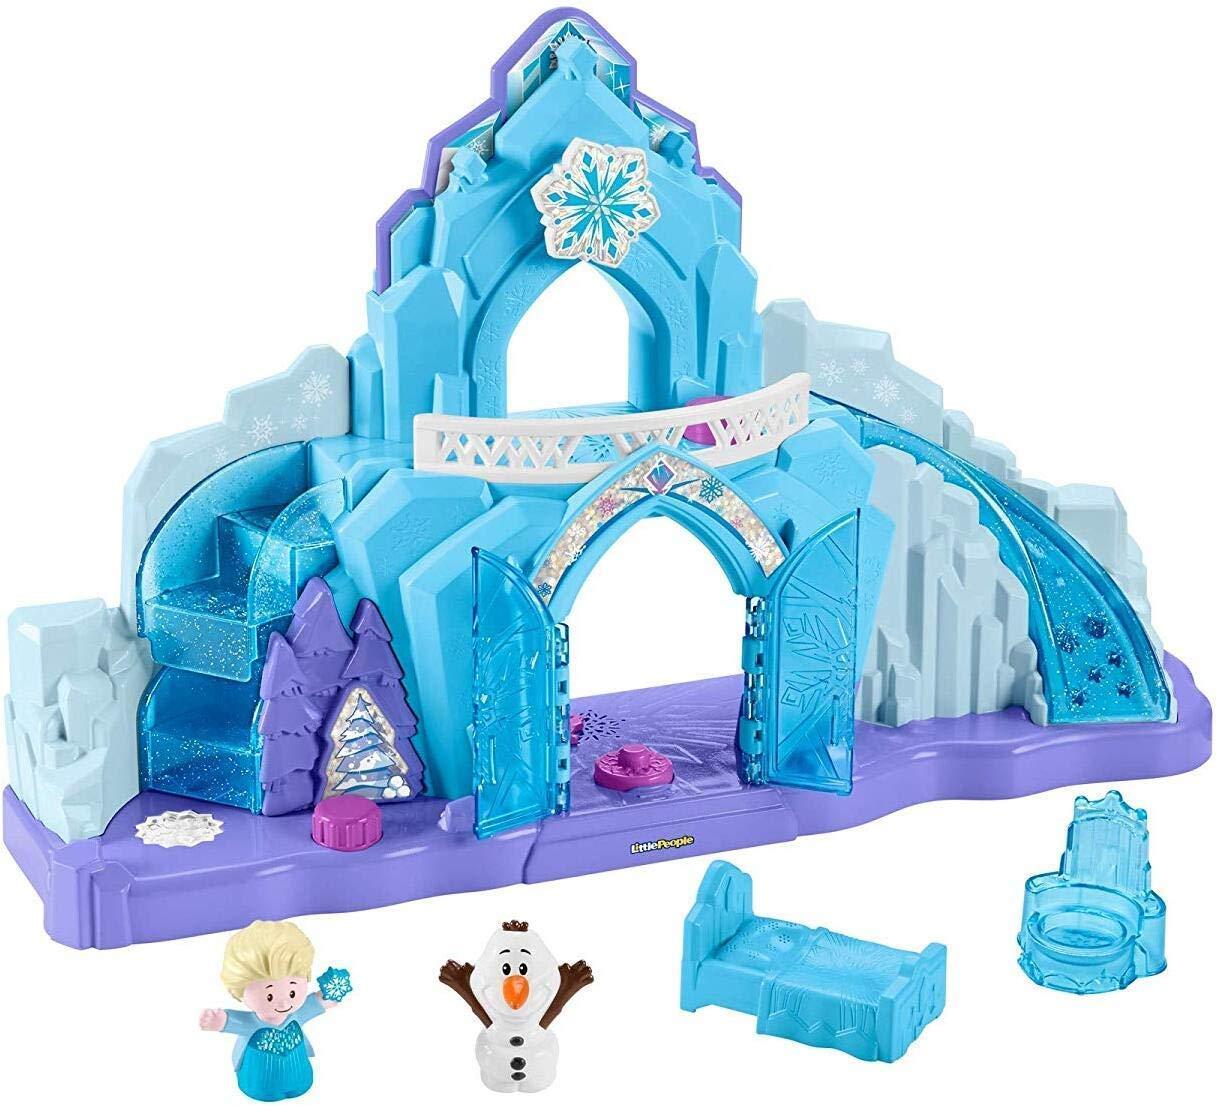 Little People GGV29 Fisher-Price Disney Frozen Elsa's Ice Palace, Musical Light-Up Playset, Multi-Colour £22.38 @ Amazon